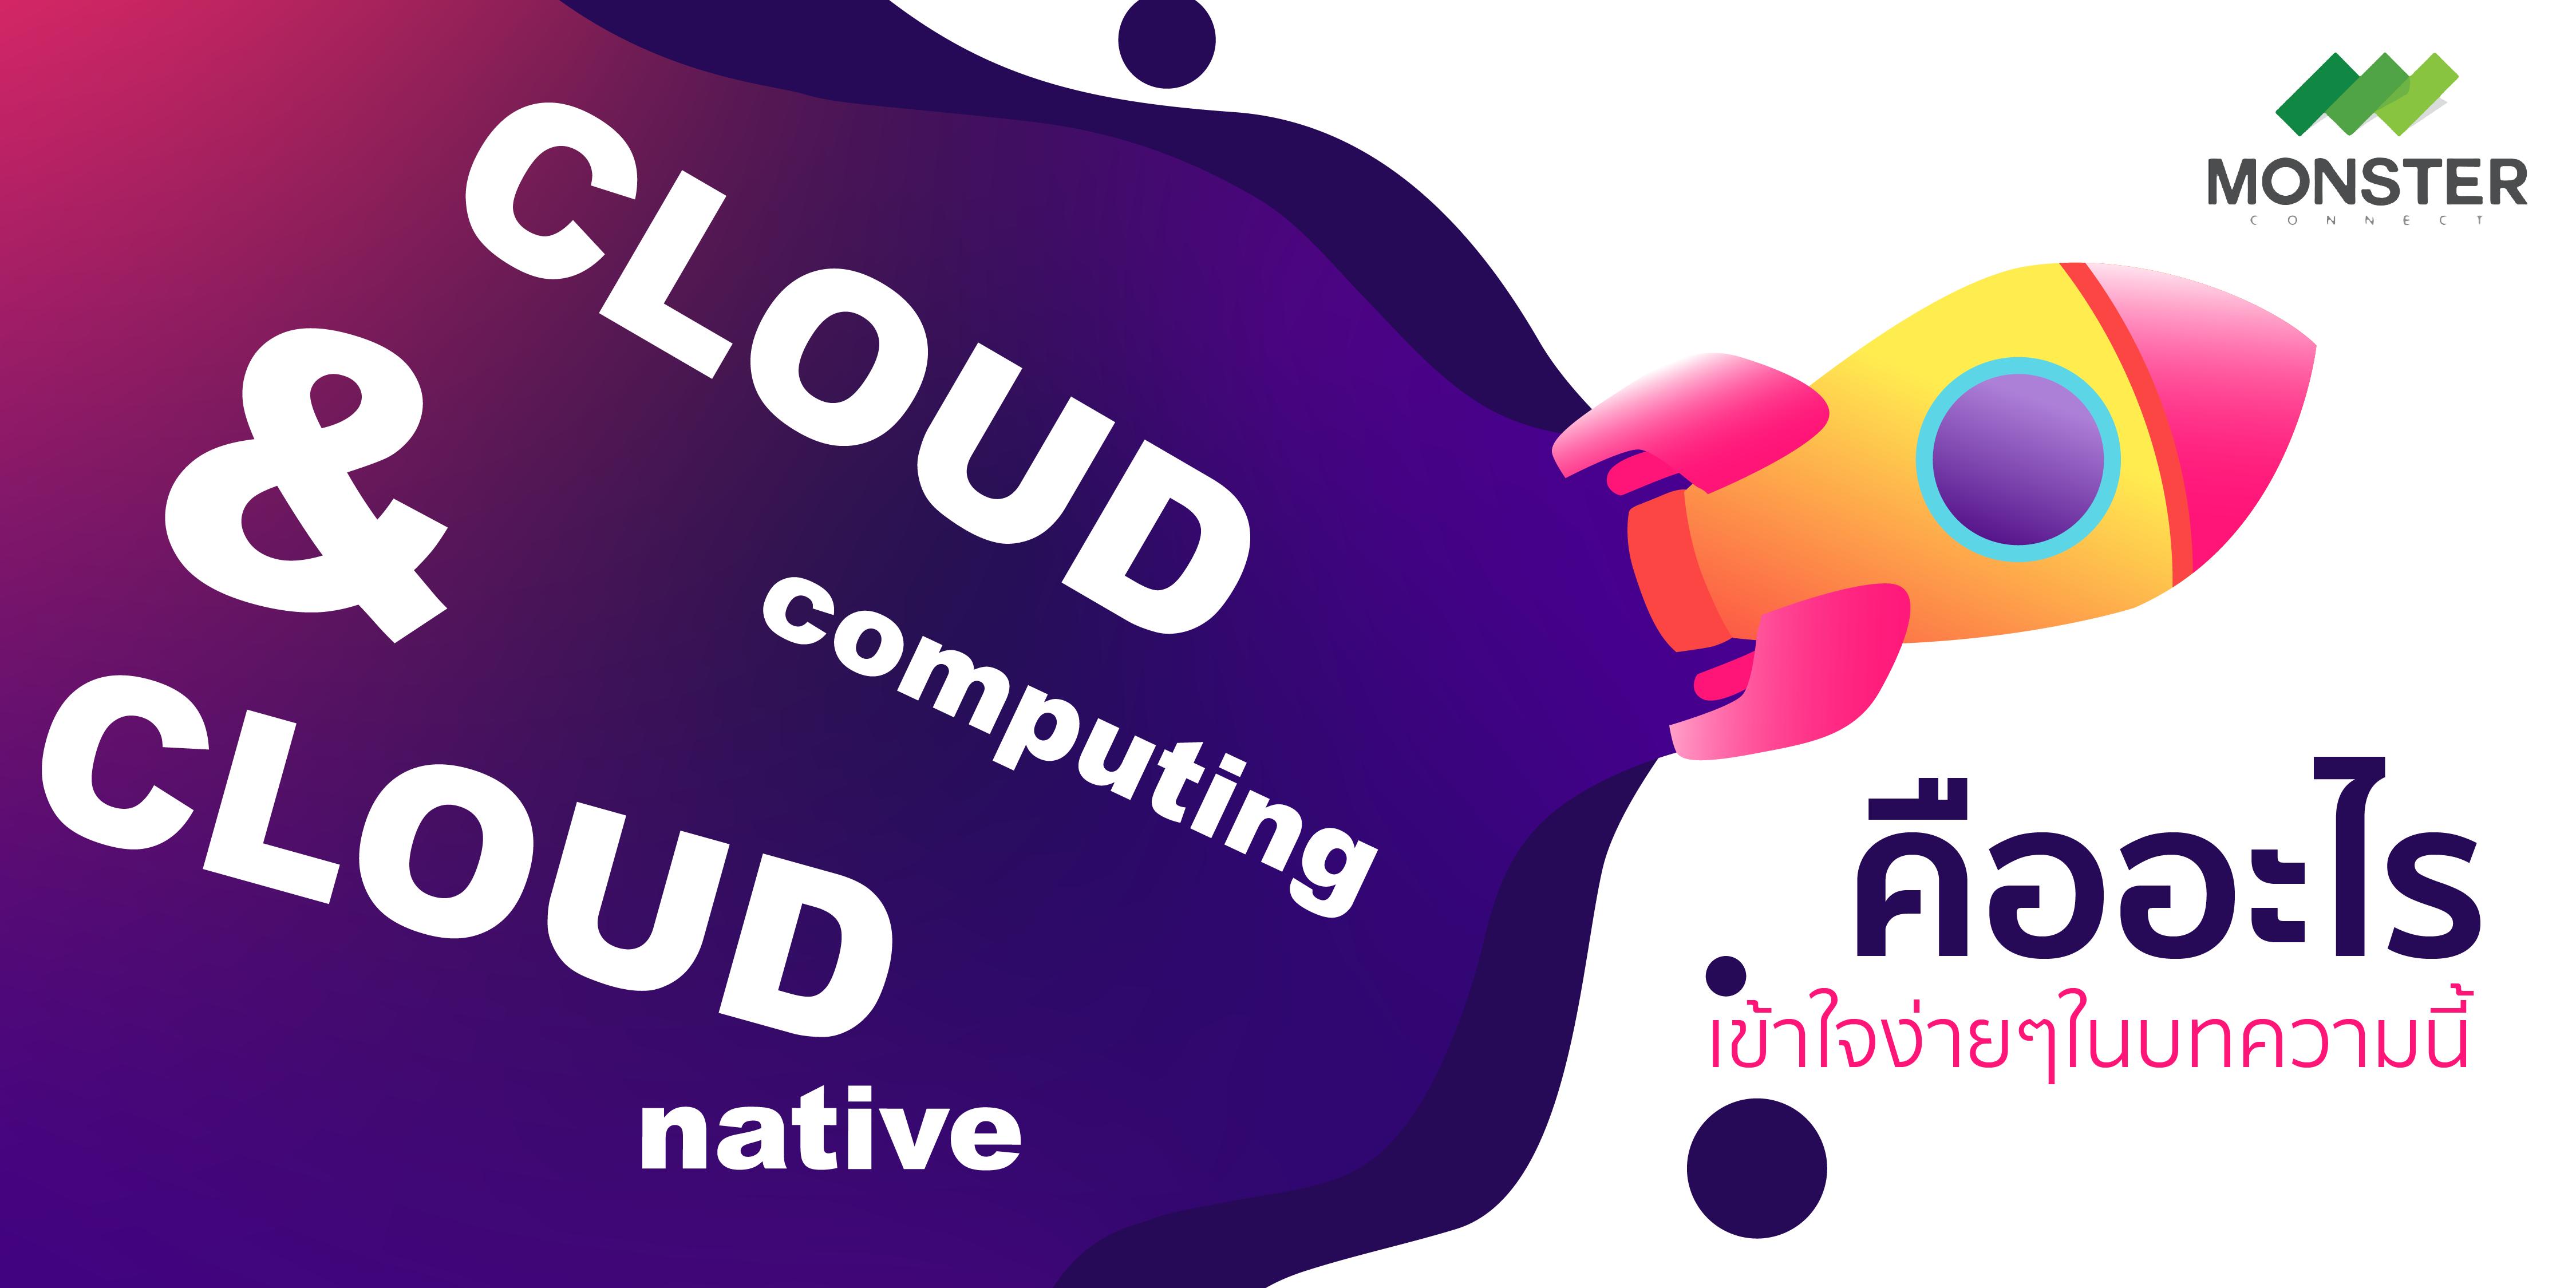 Cloud computing กับ Cloud native คืออะไรต่างกันยังไง